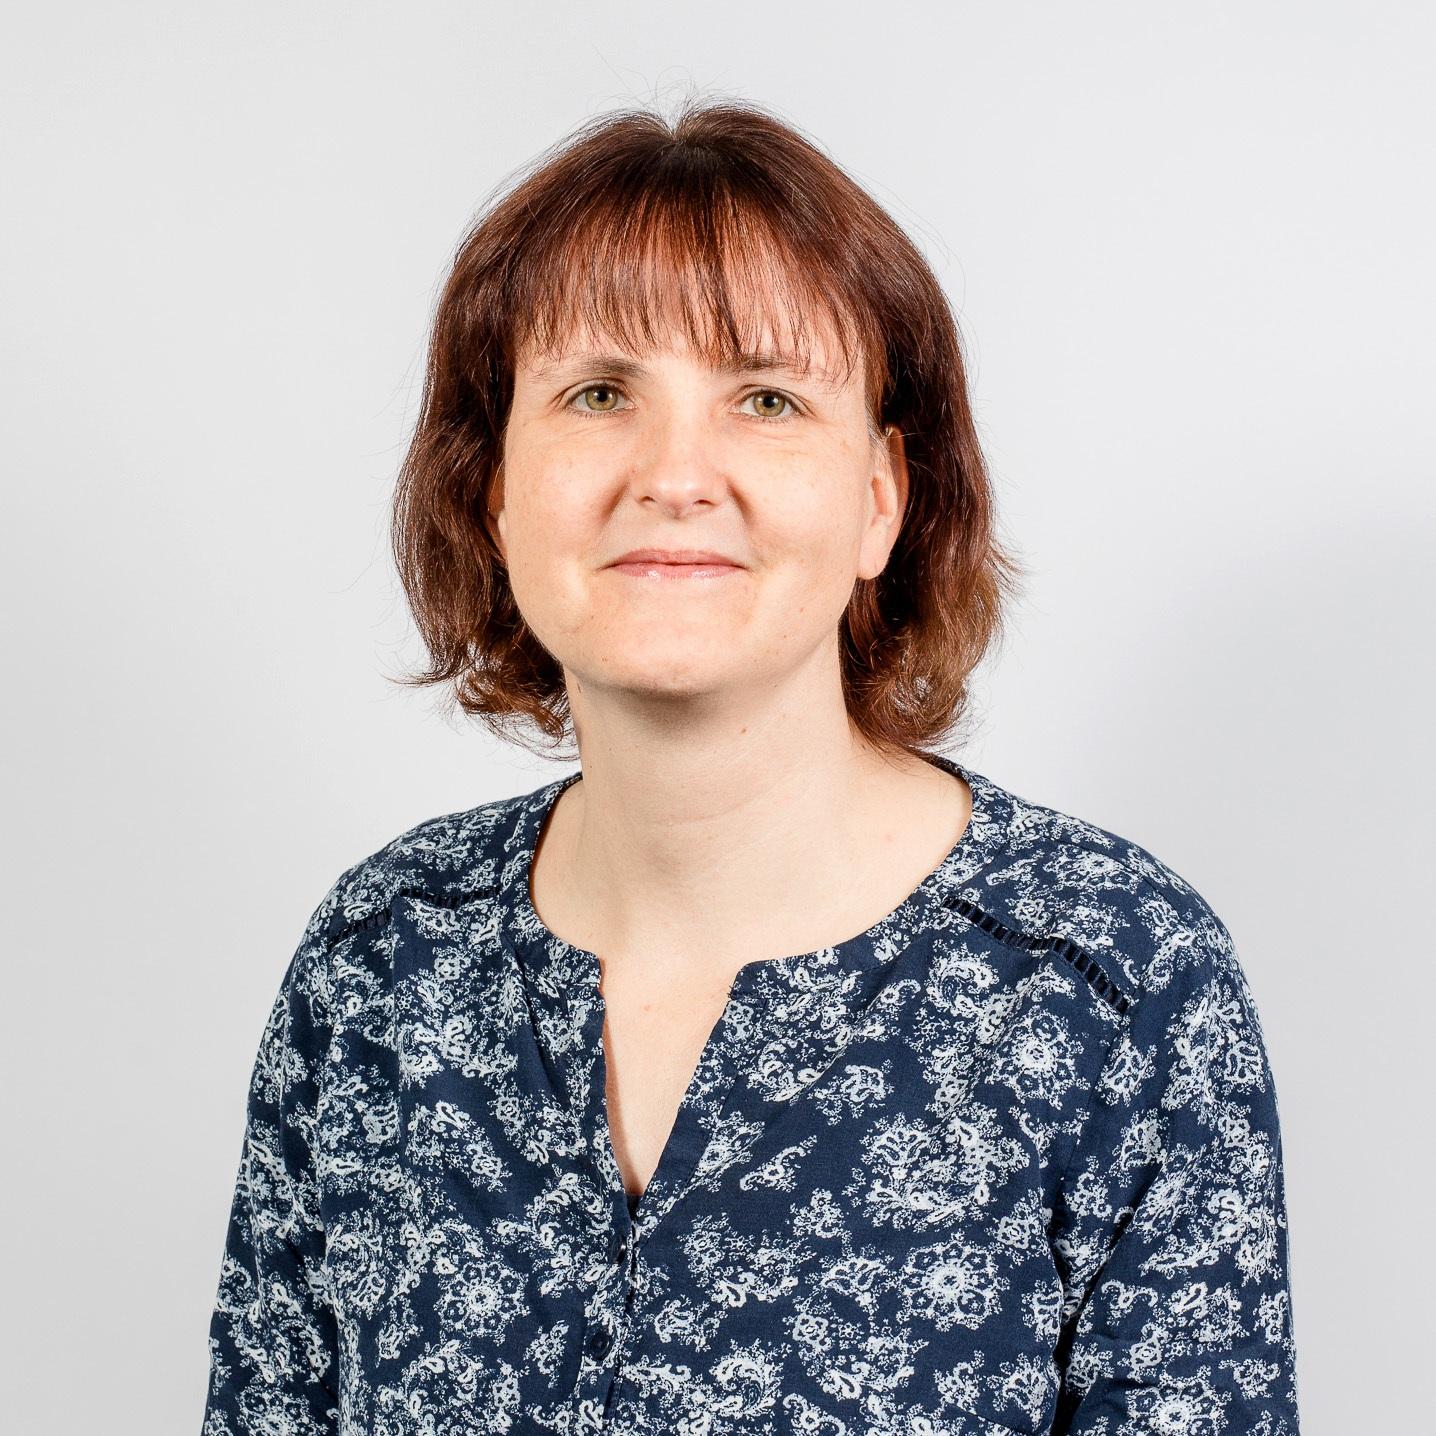 Martina Groppel